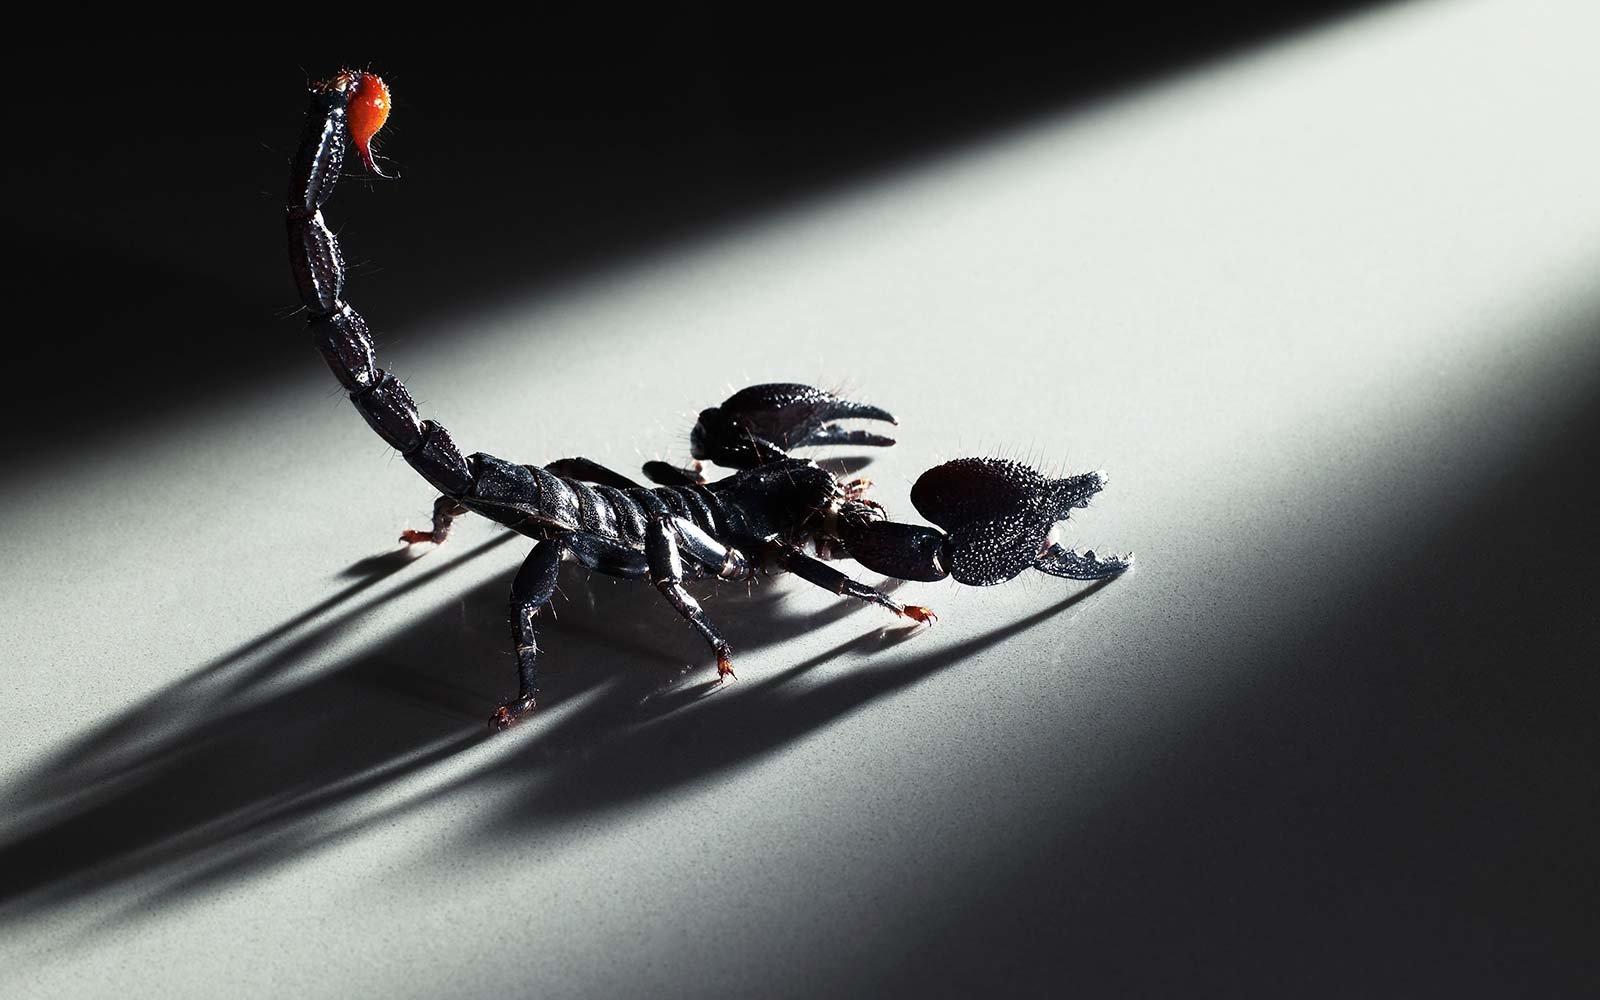 К чему снится скорпион — сонник: скорпион